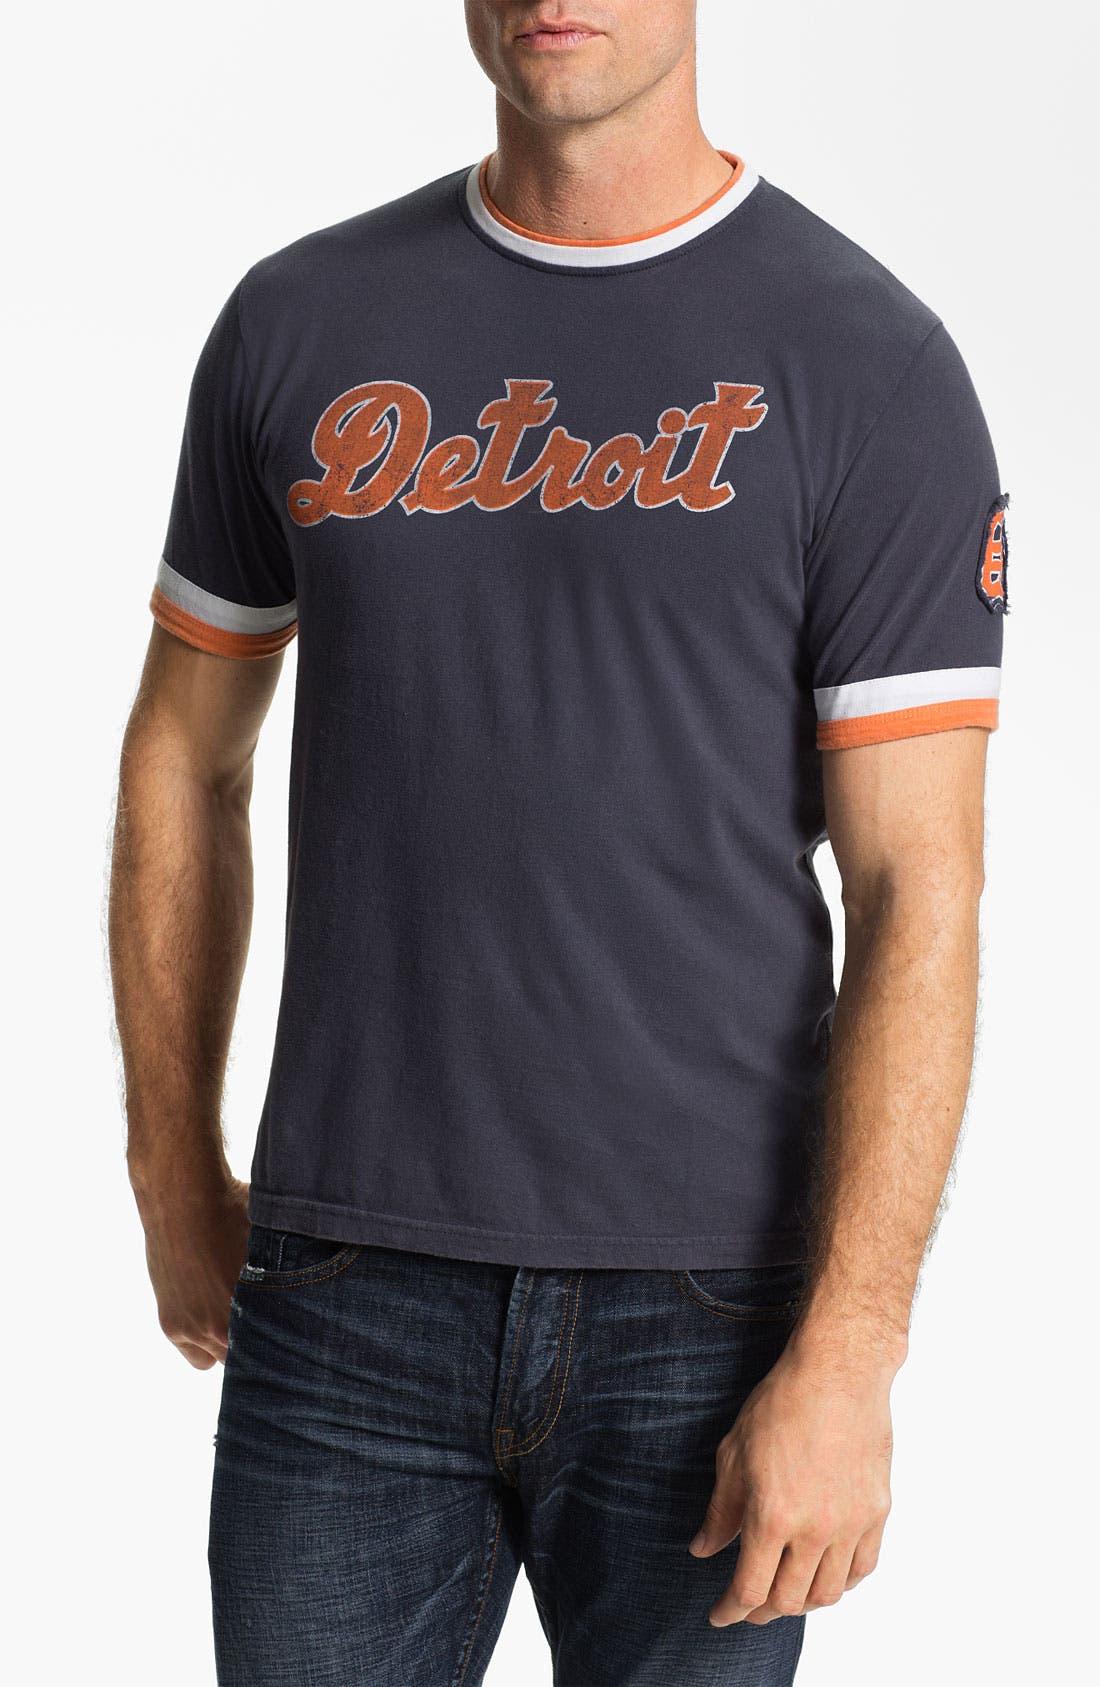 Main Image - Red Jacket 'Detroit Tigers' Trim Fit Ringer T-Shirt (Men)